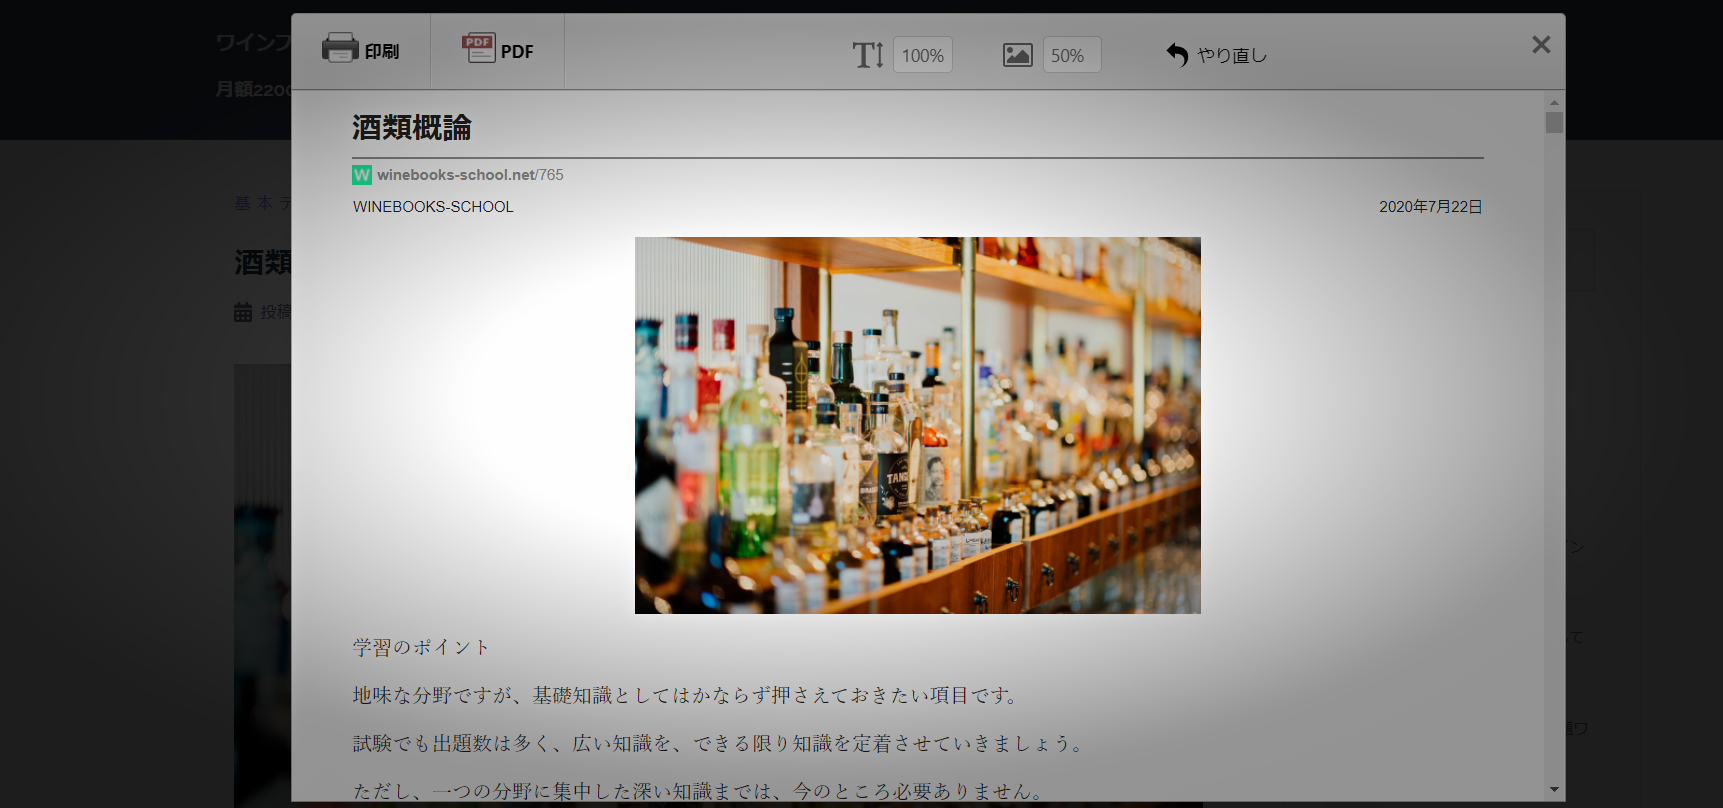 "<span class=""title"">PDF,プリントボタンの設置のお知らせ</span>"